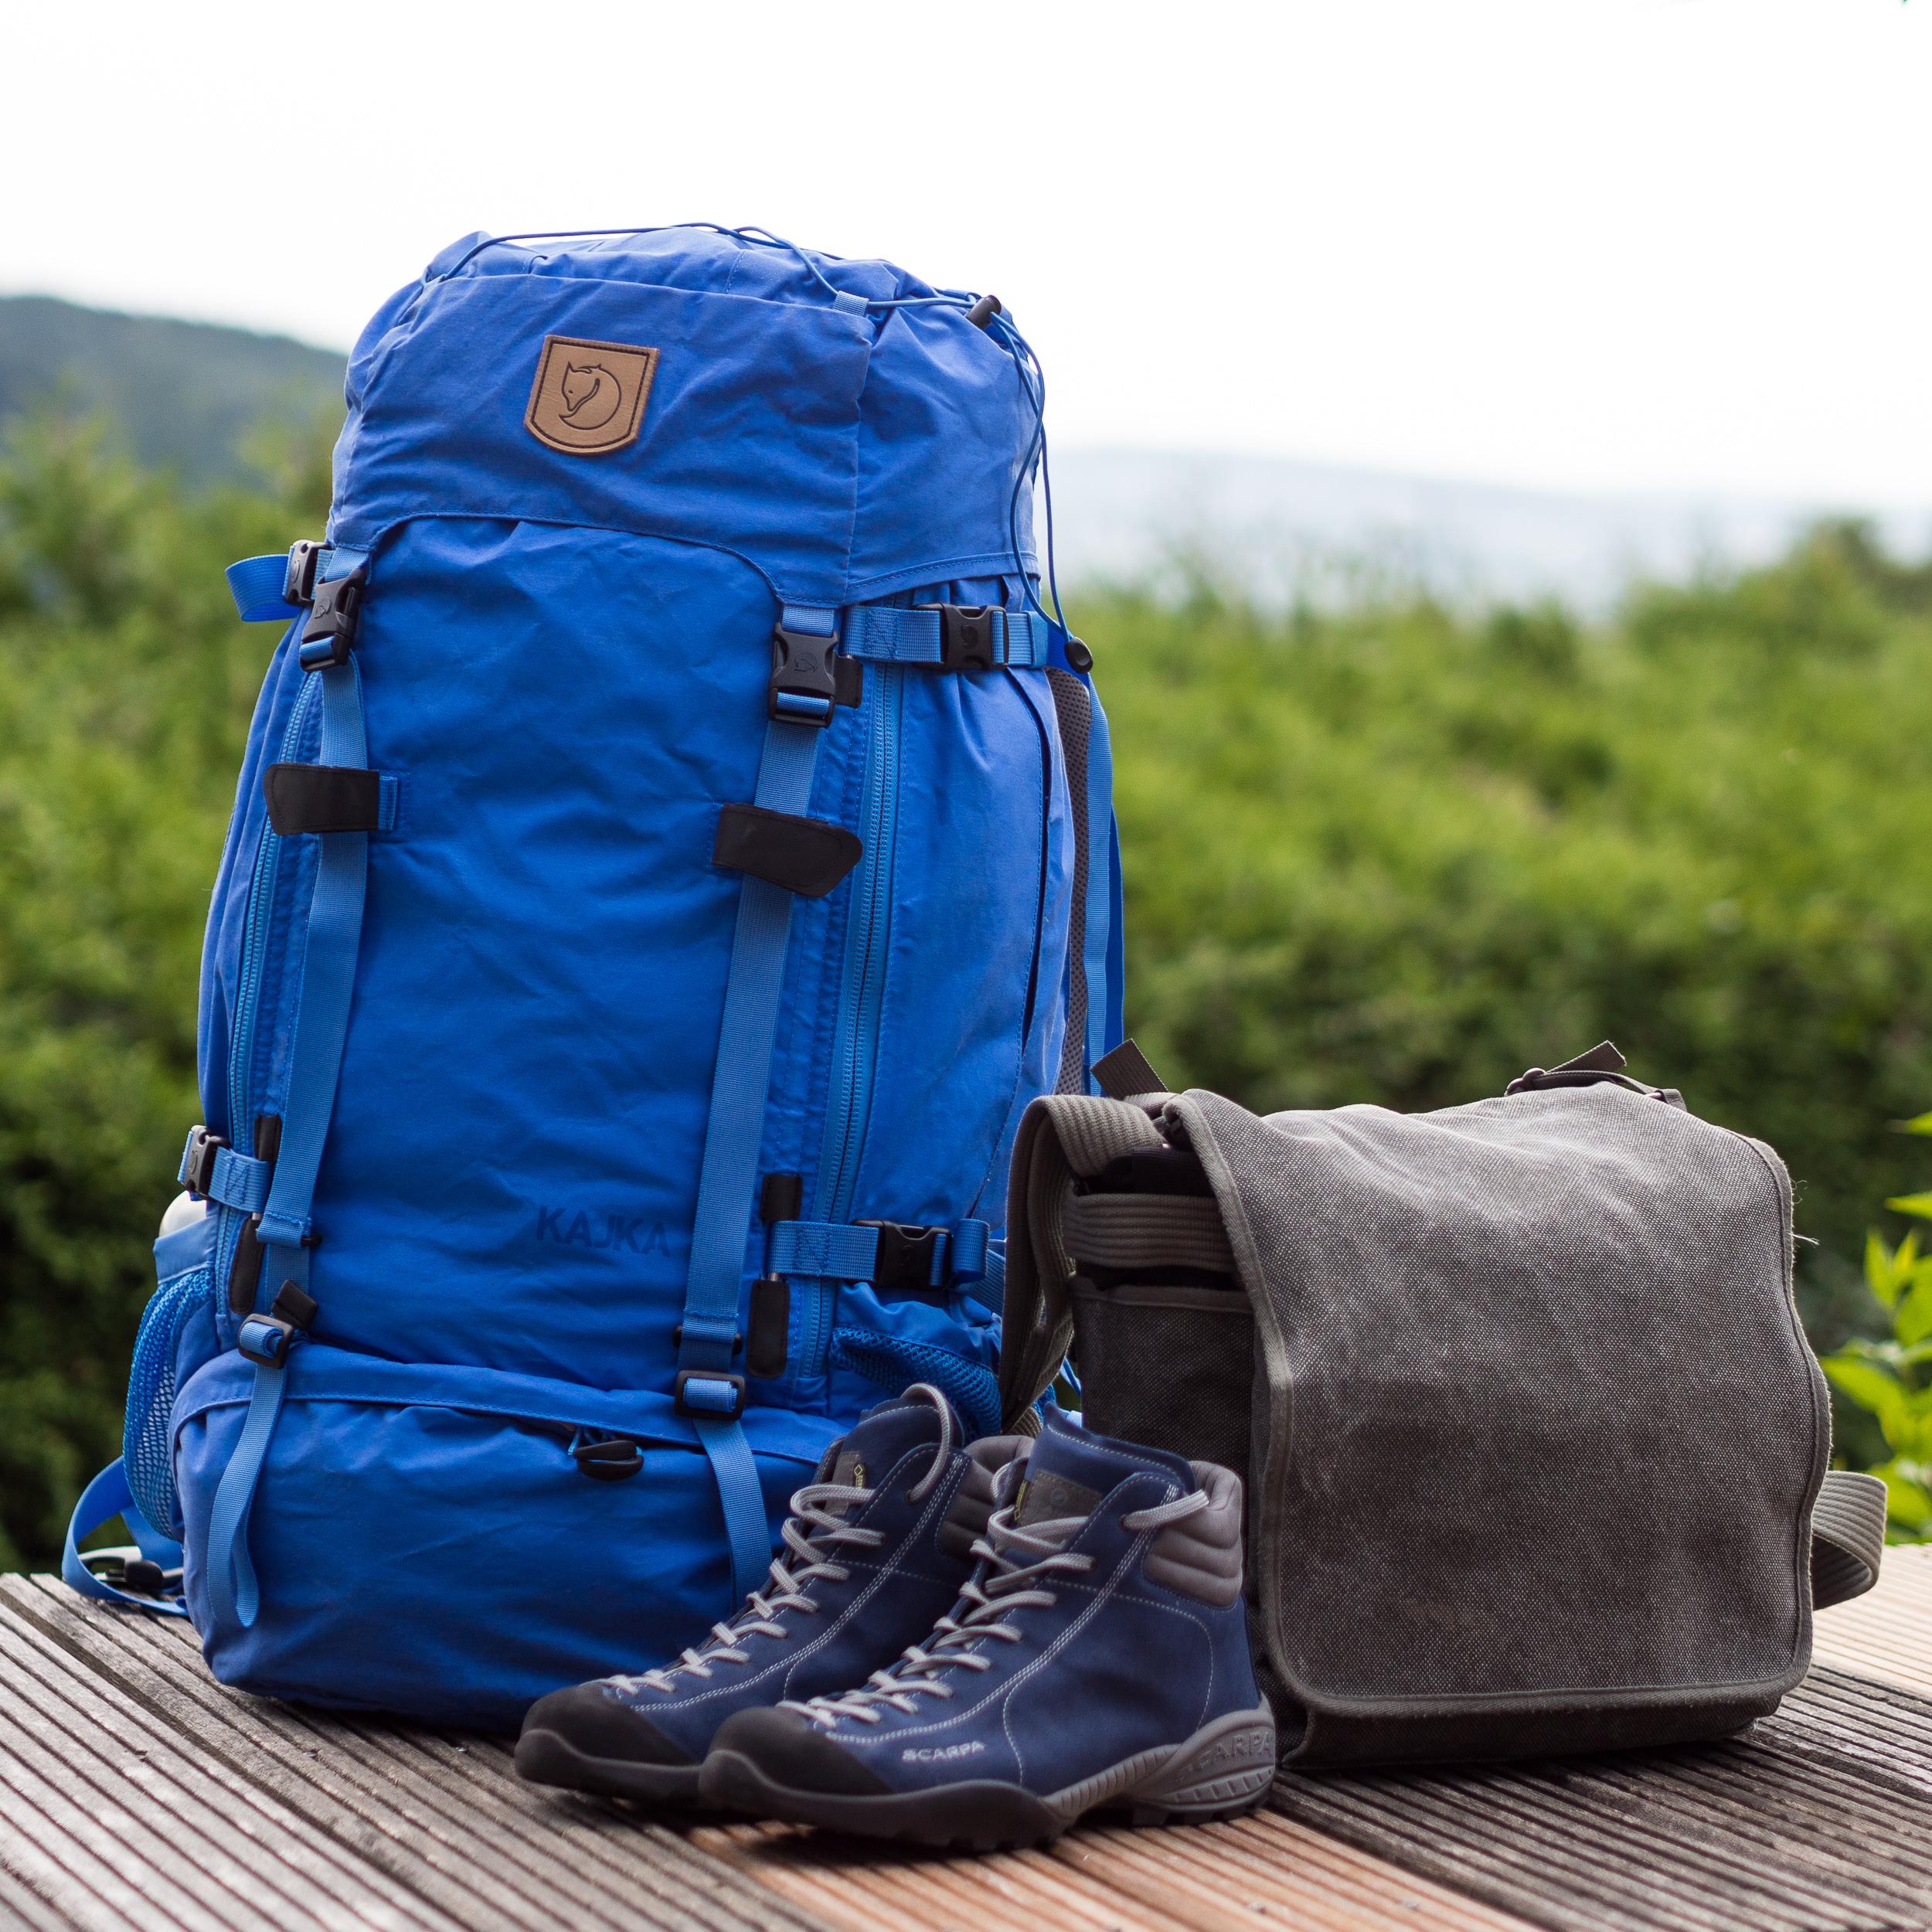 My Fjallraven Kajka 65L backpack and the Think-Tank Retrospective 20 camera bag.